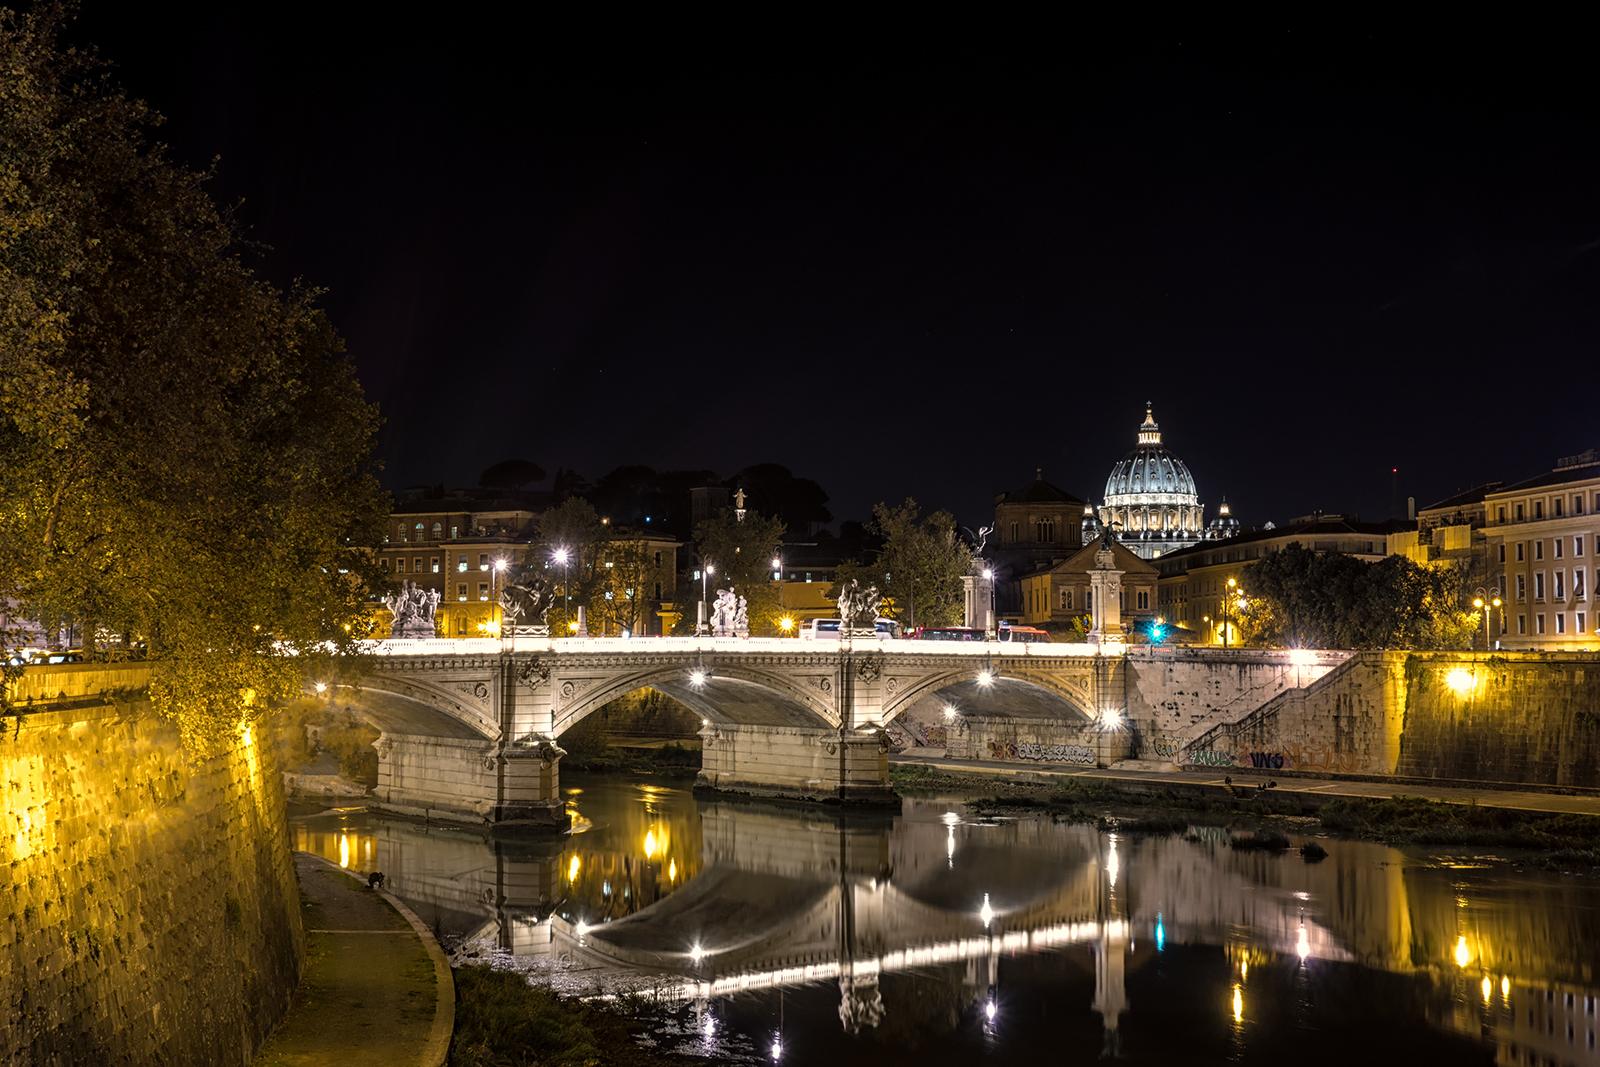 ST. PETER'S BASILICA, Rome, long exposure, night, pope, lights, basilica, church, bridge